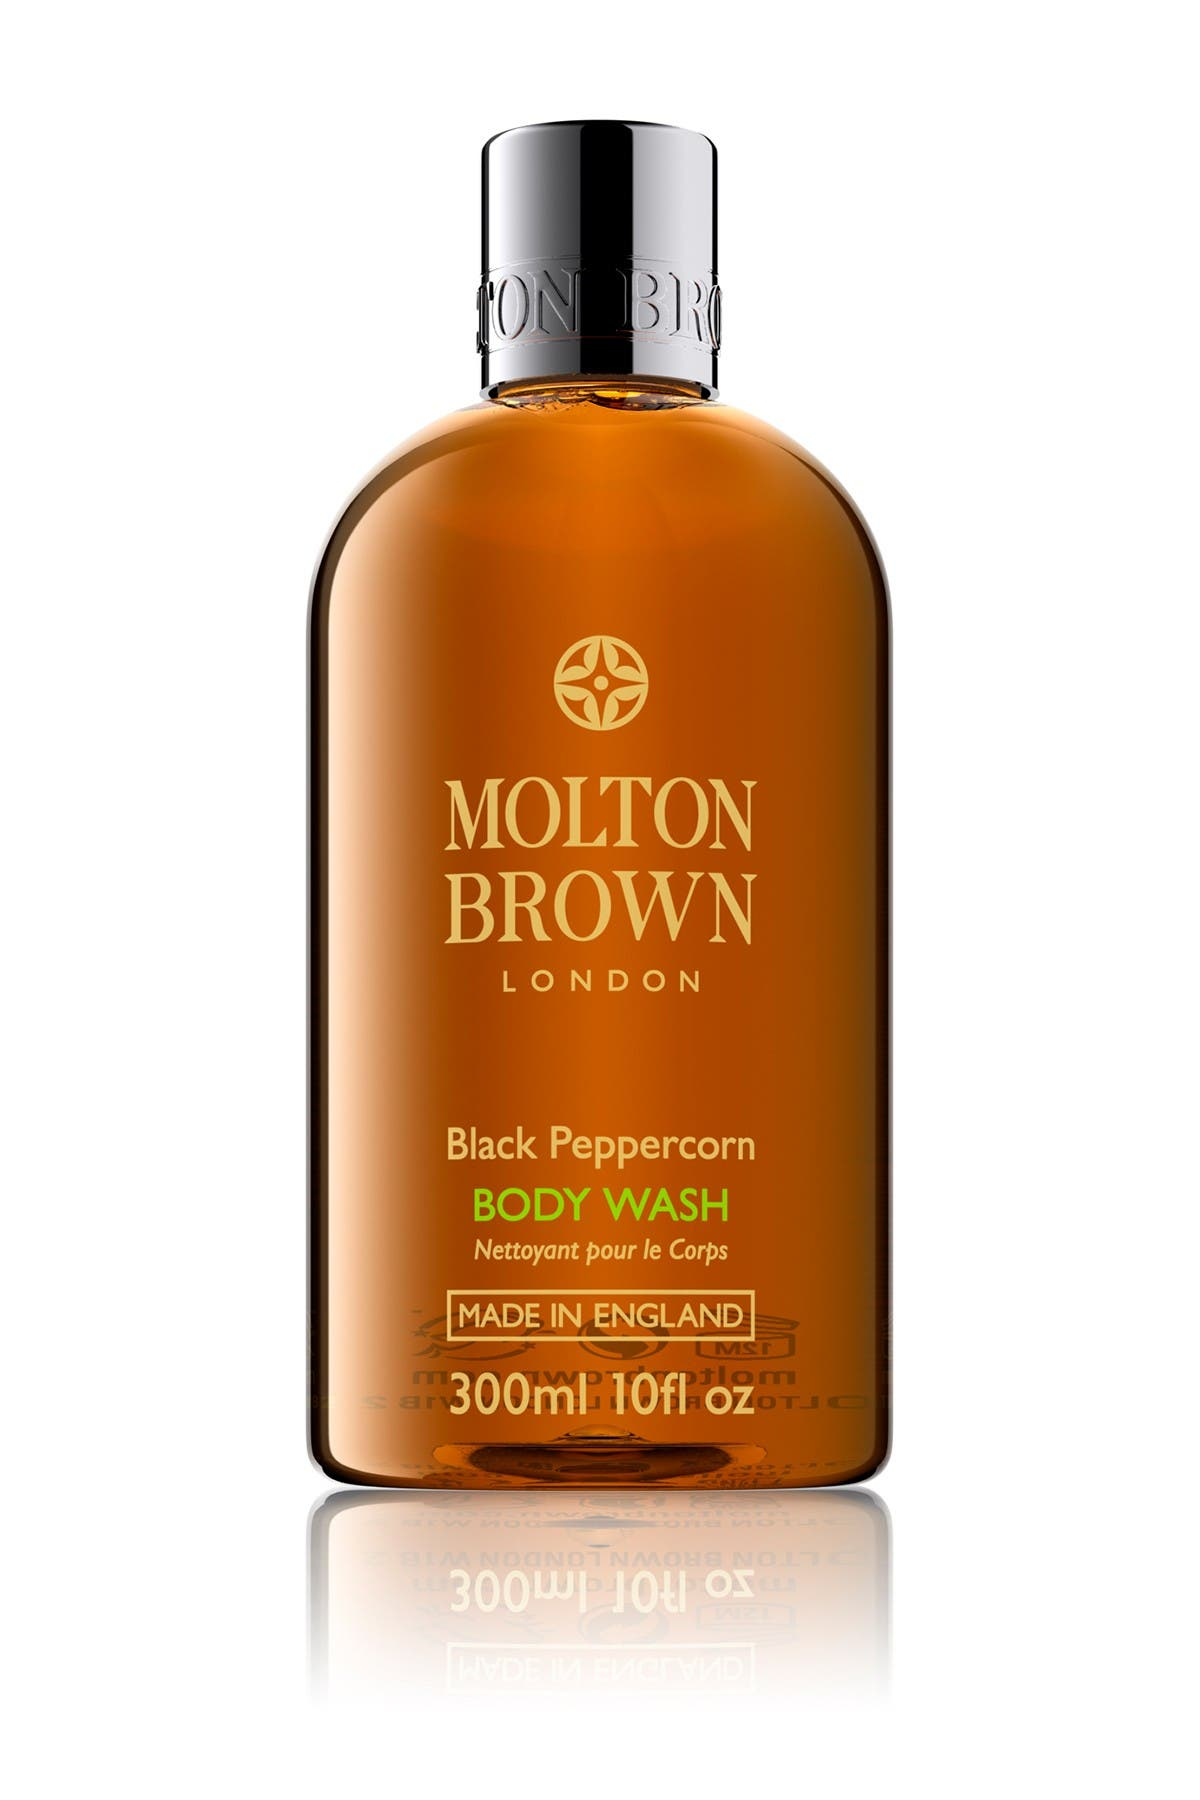 Image of Molton Brown Black Peppercorn Body Wash